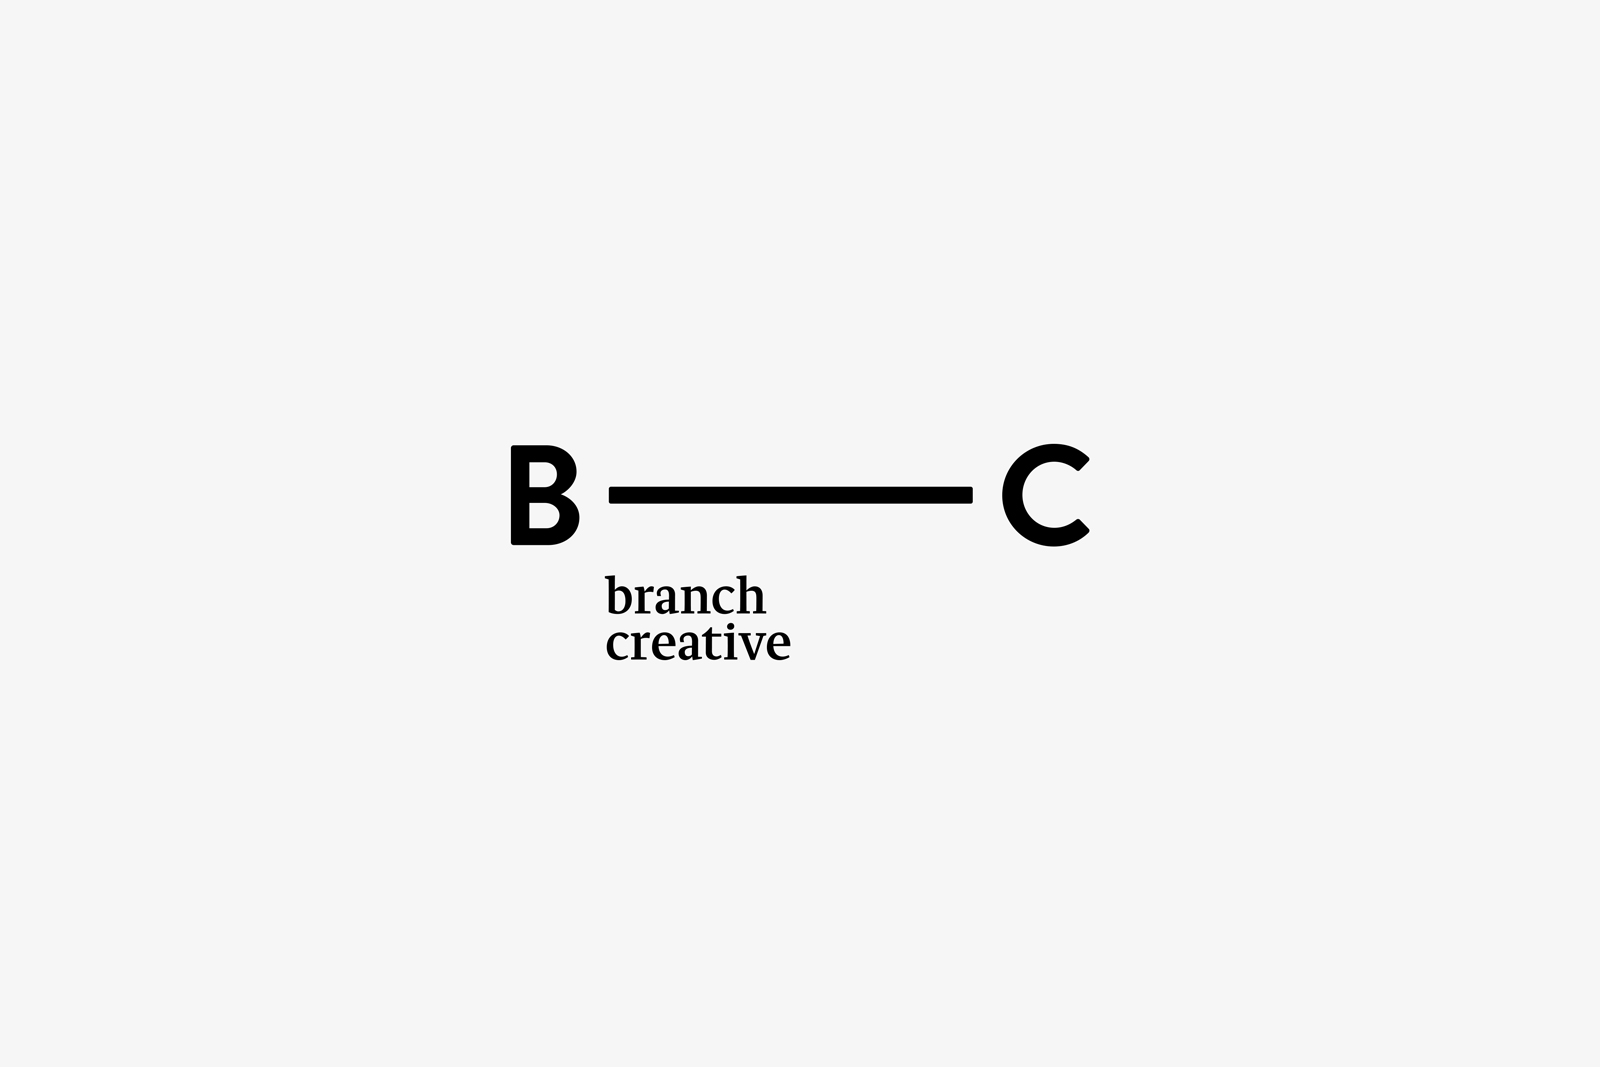 branch-creative-001